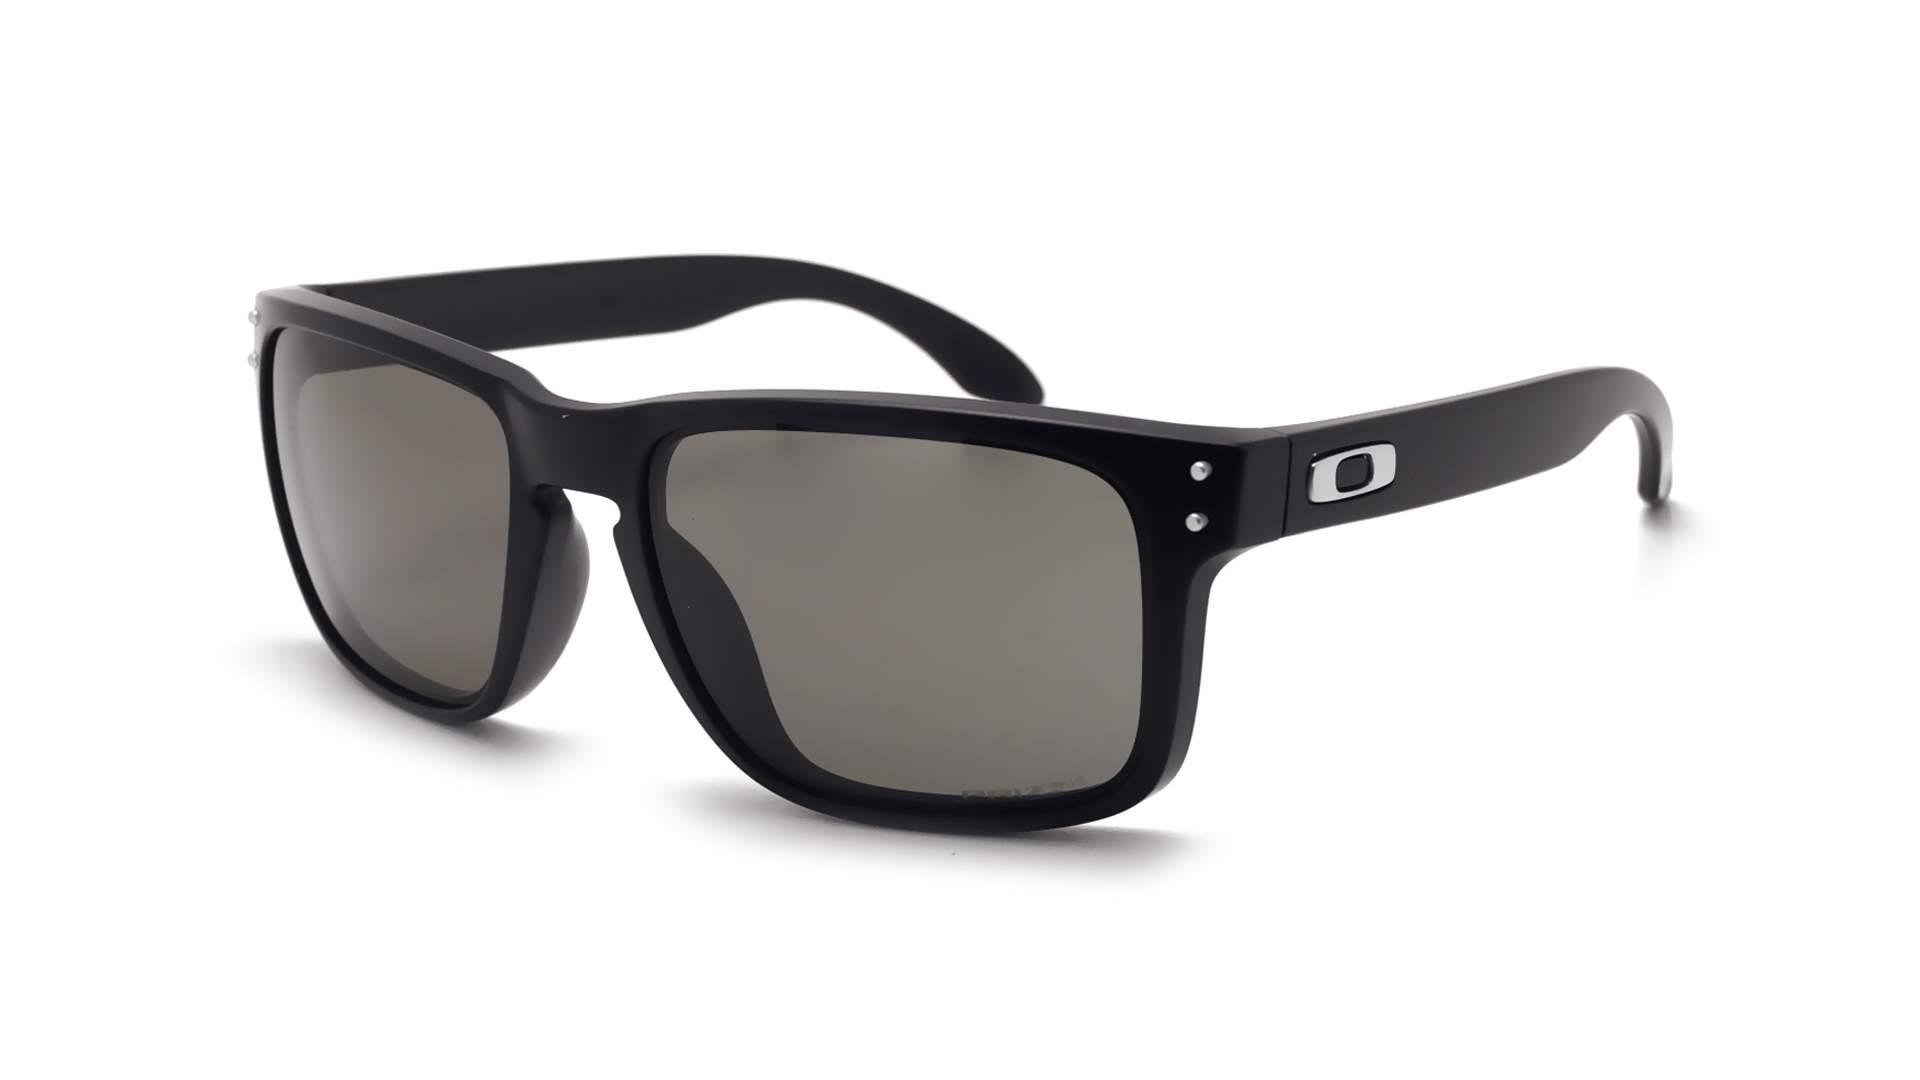 1b5c4aa2f Sunglasses Oakley Holbrook Black Matte Prizm OO9102 E8 55-18 Medium